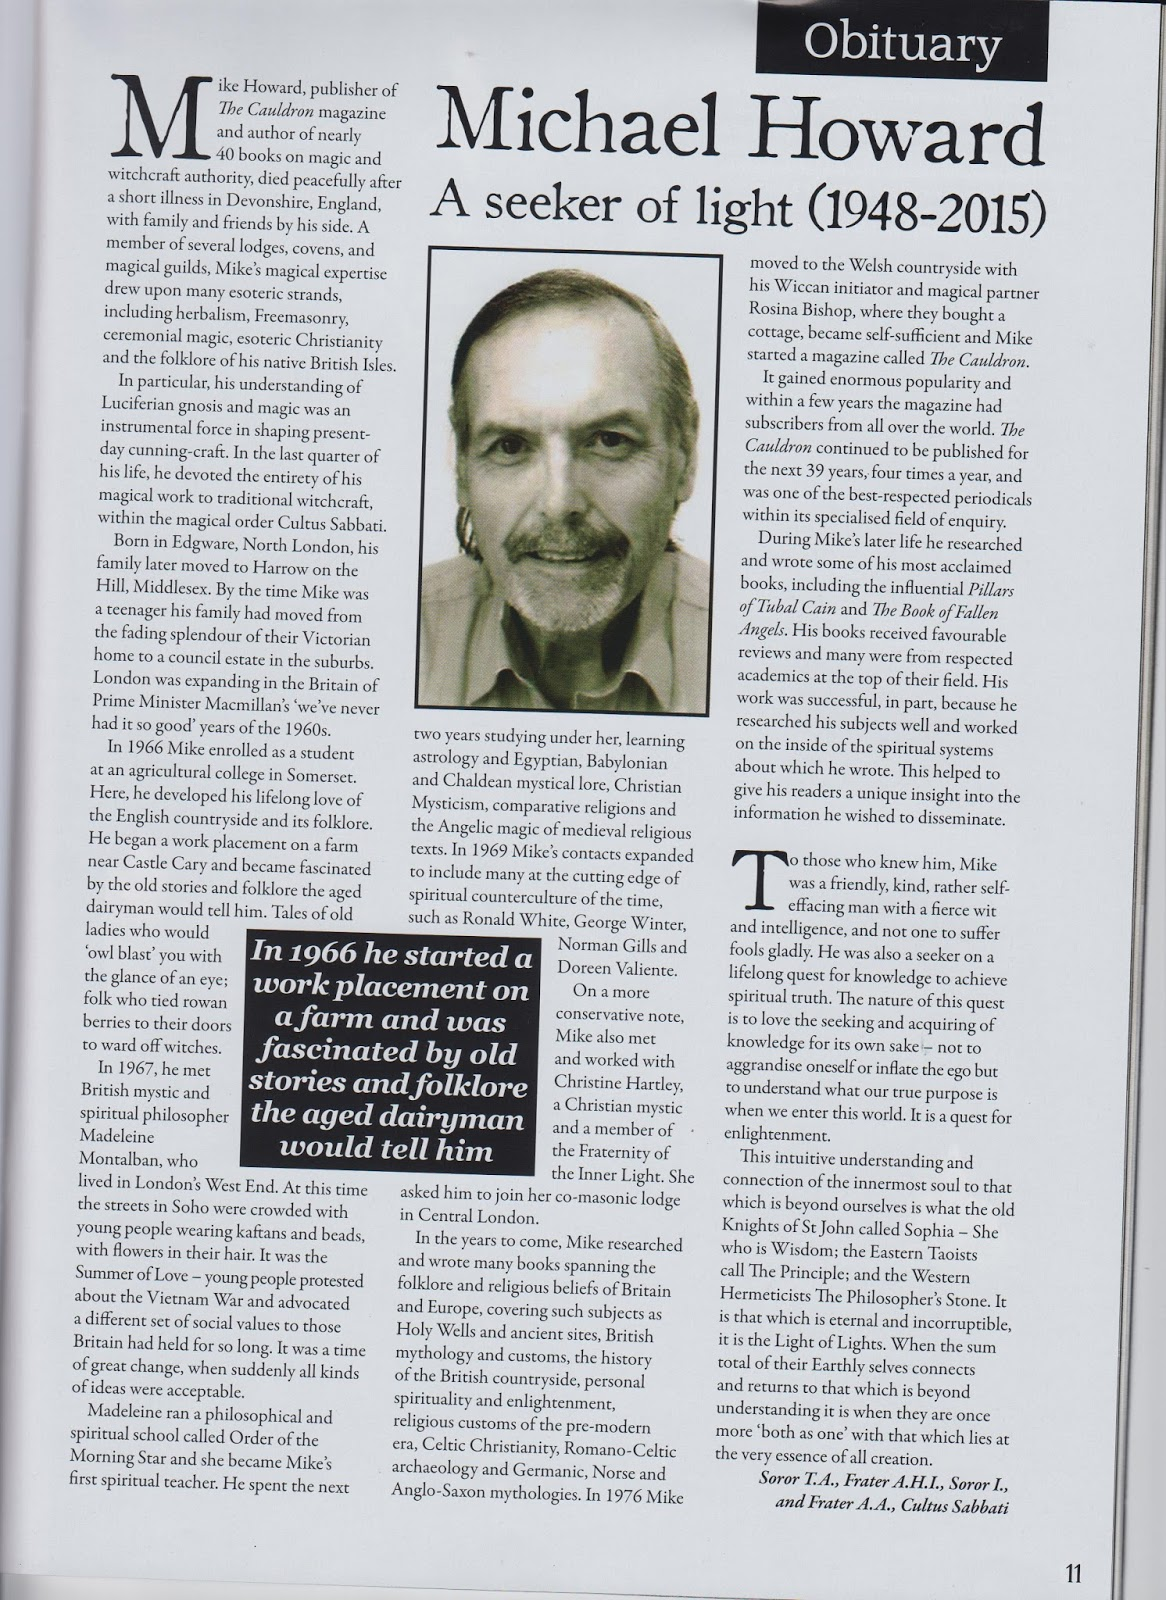 Mike Howard obituary in Pagan Dawn